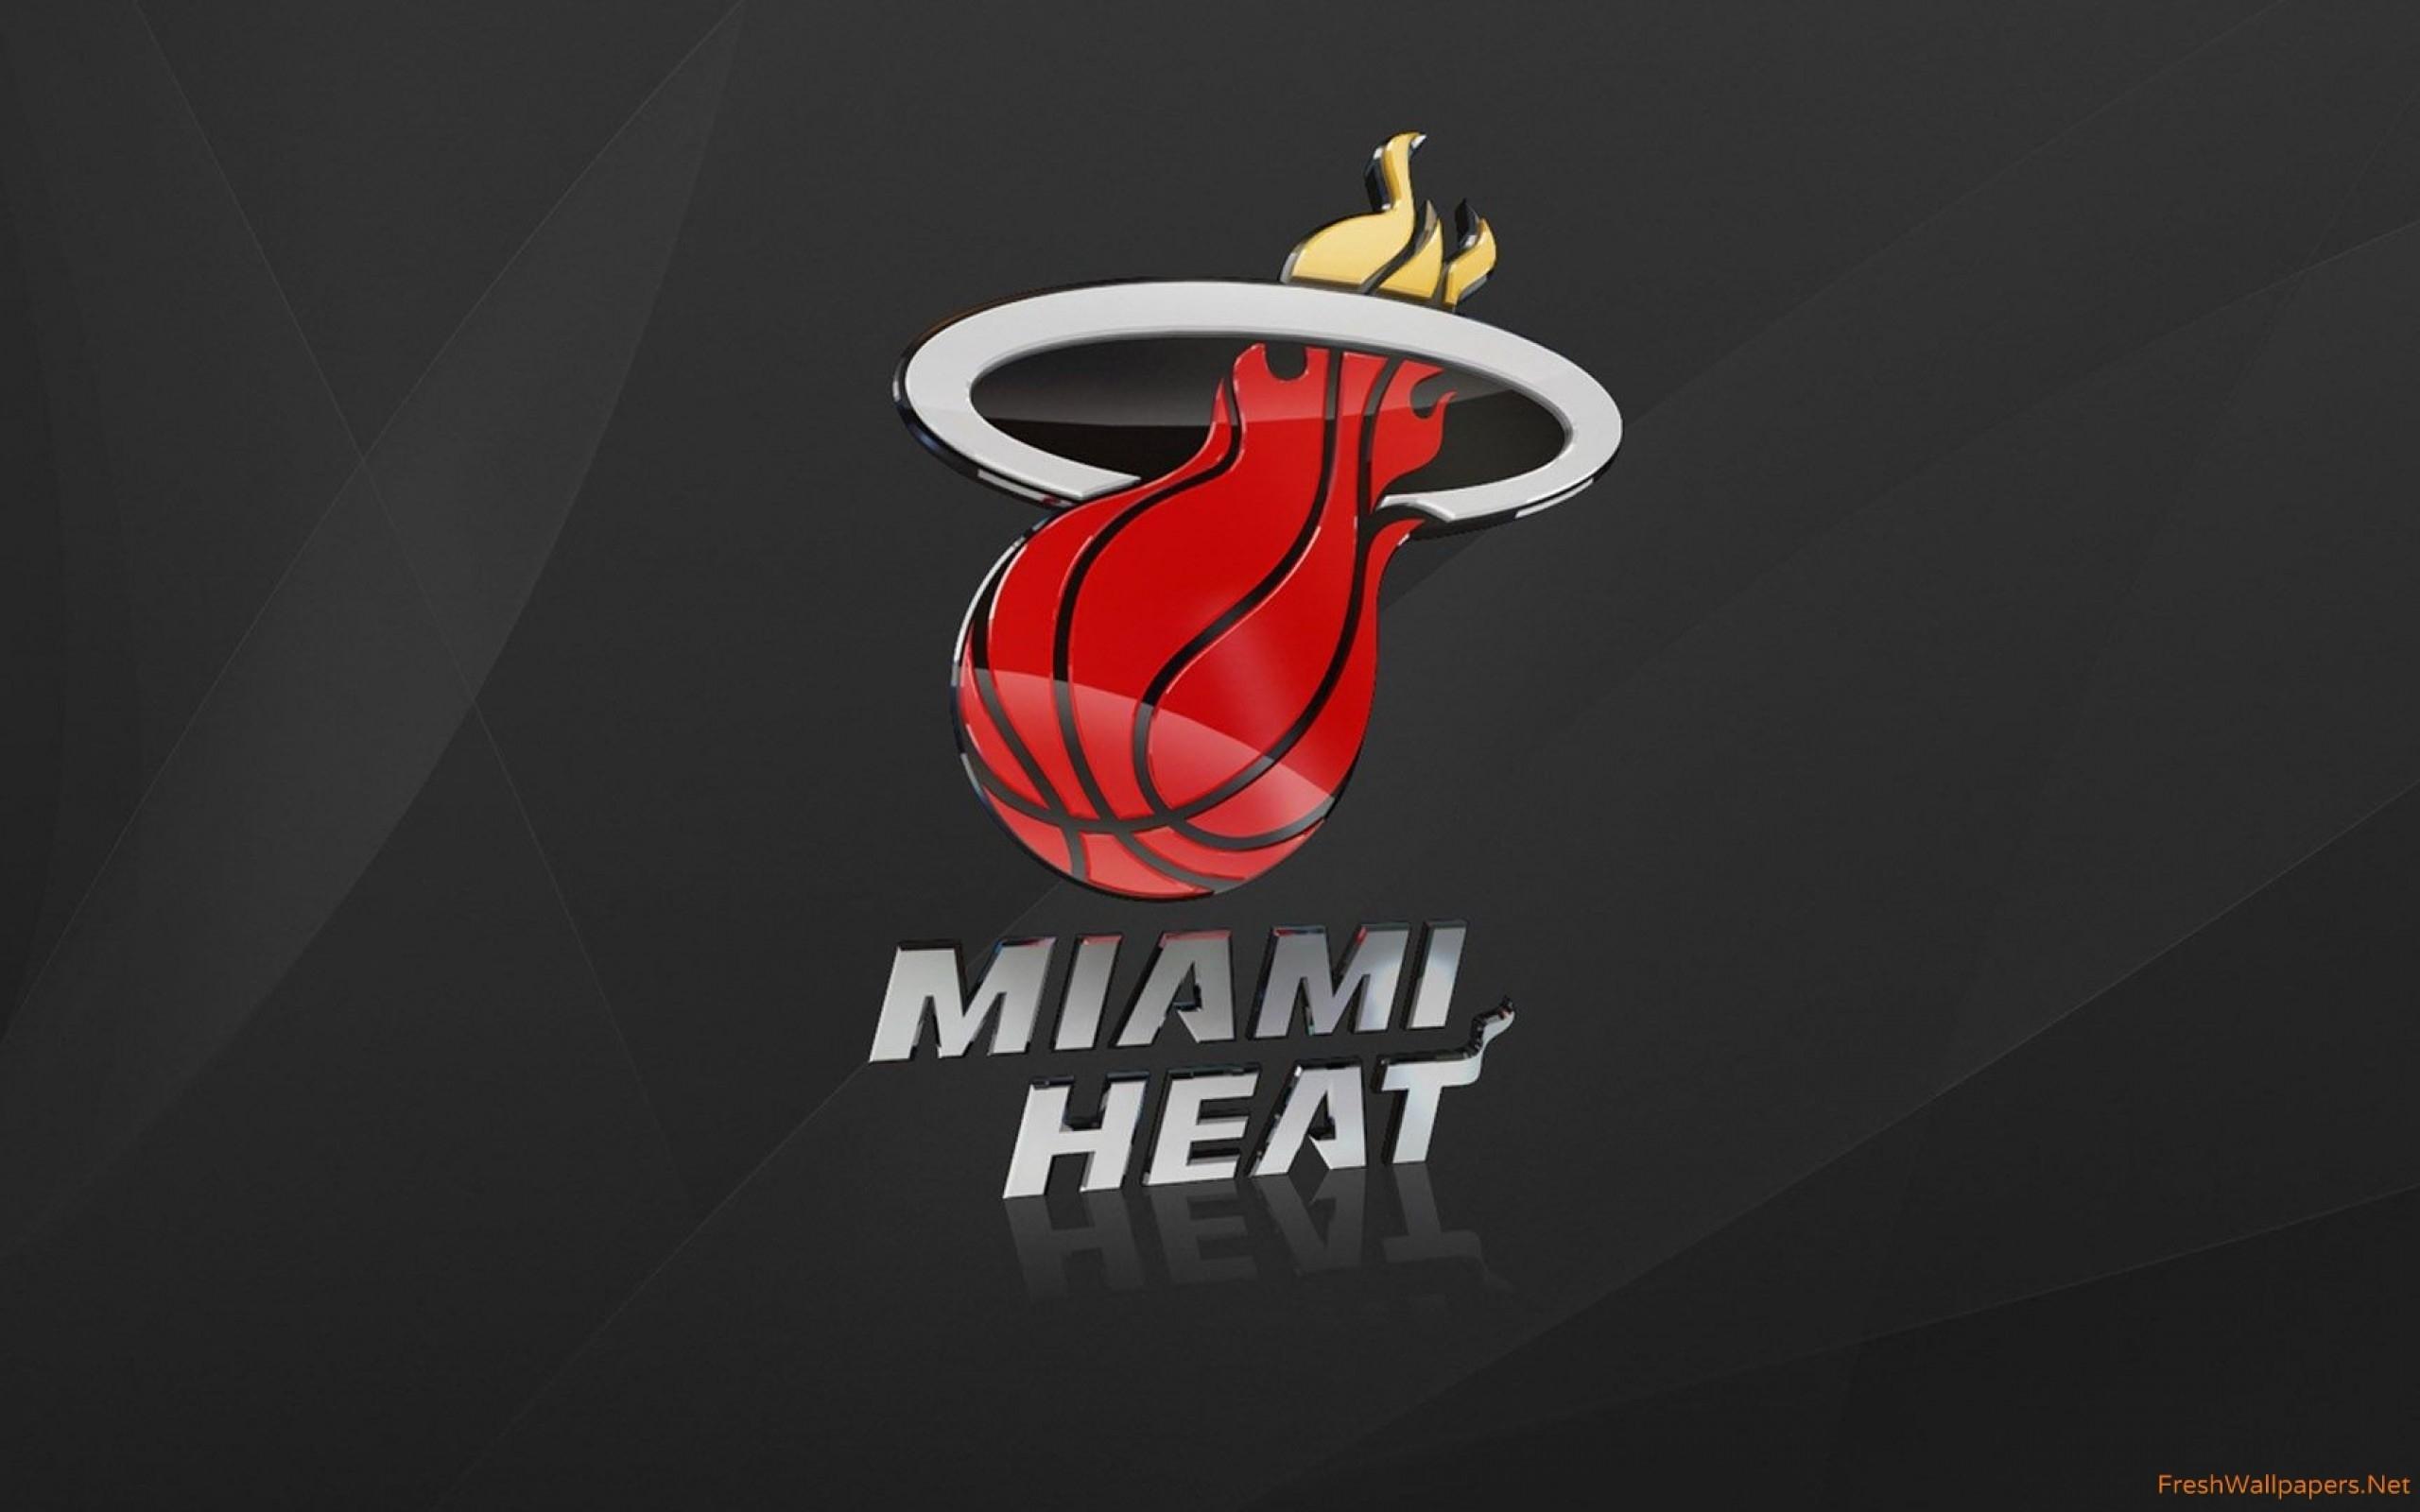 miami heat logo wallpapers   freshwallpapers